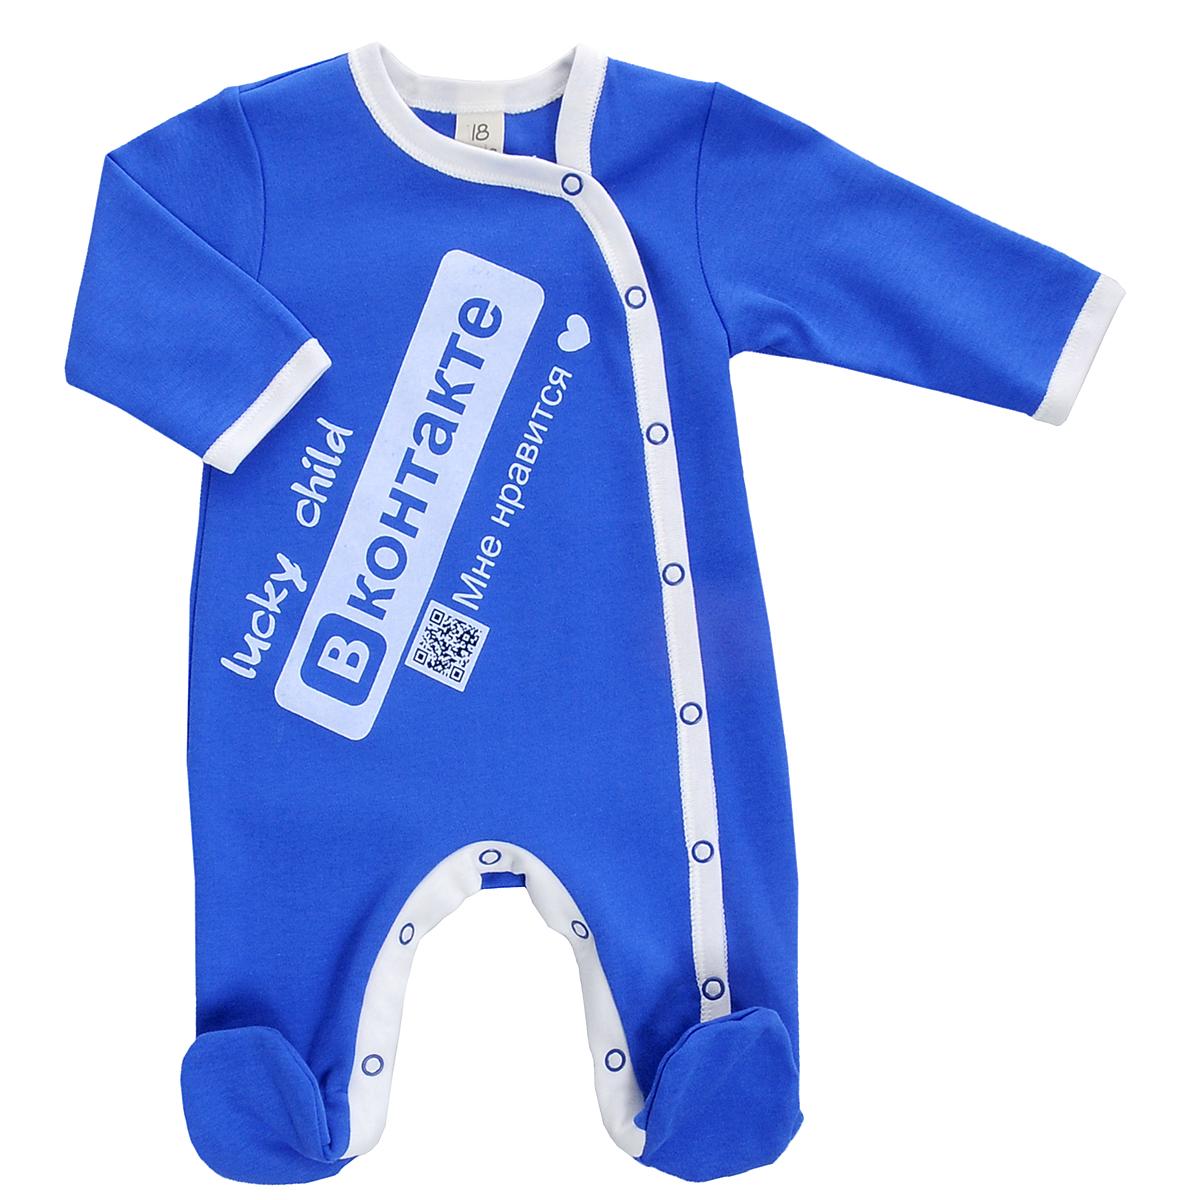 Комбинезон для мальчика Lucky Child, цвет: синий. 9-162. Размер 68/74